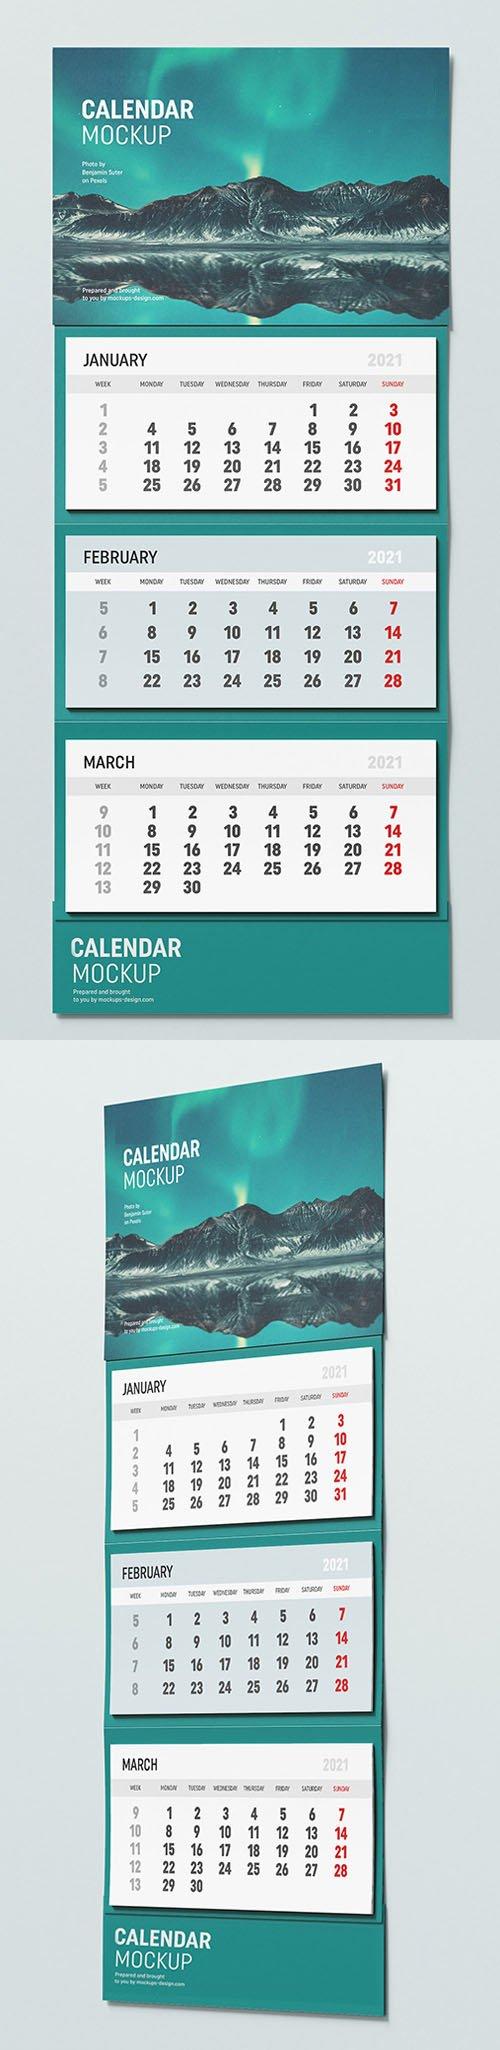 New Year 2021 Wall Calendar PSD Mockup Template